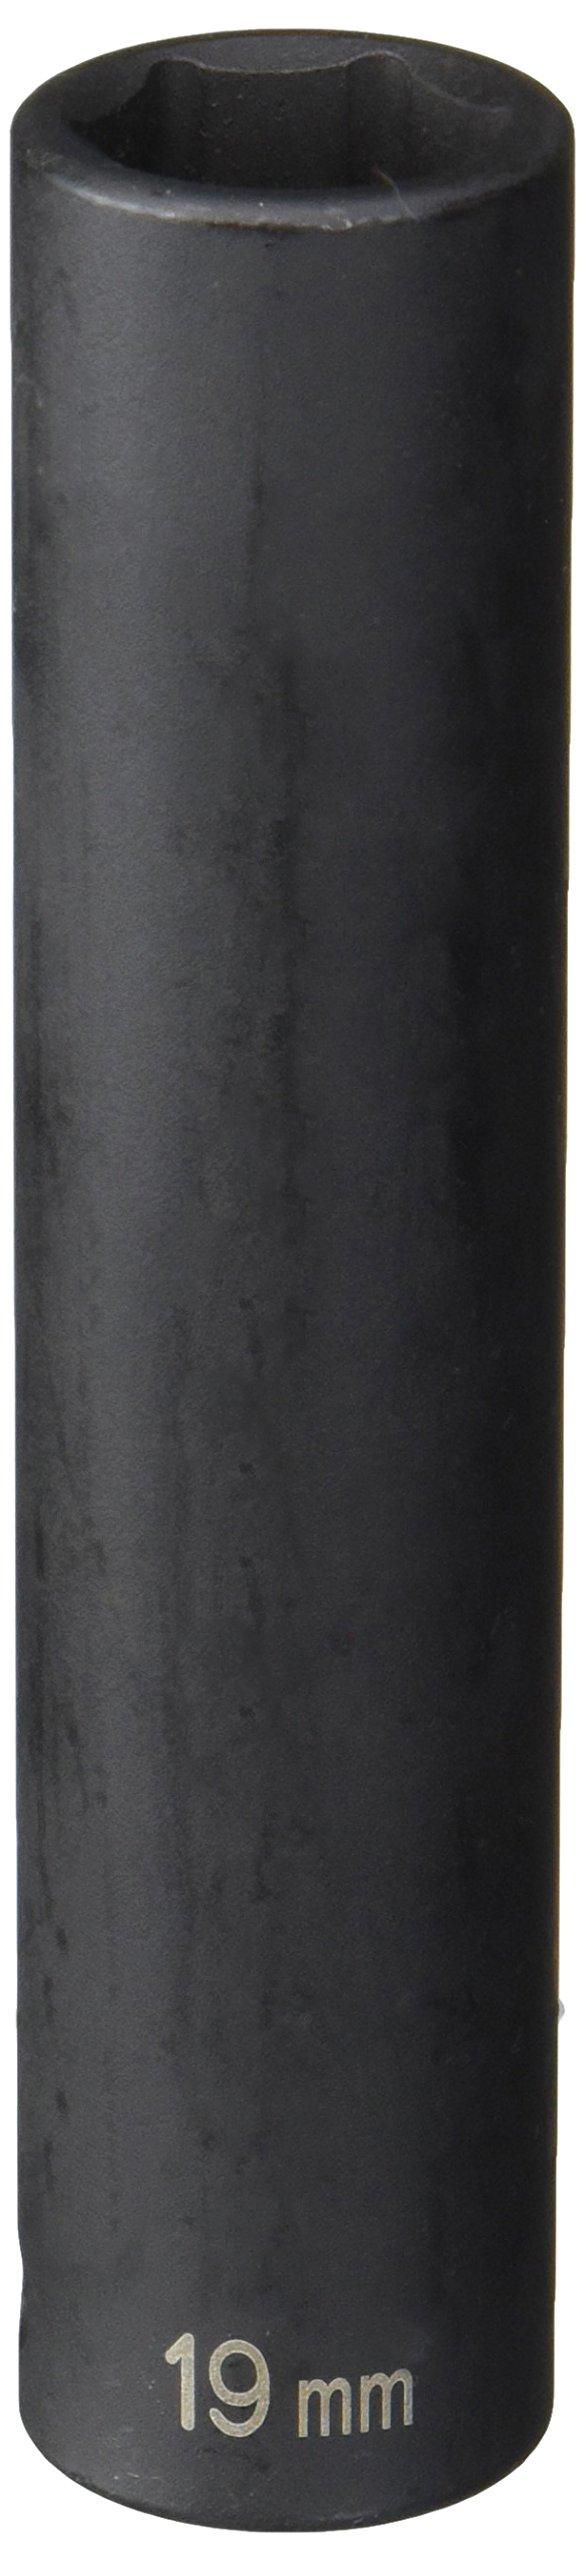 Grey Pneumatic (2019XMD) 1/2'' Drive x 19mm Extra-Deep Socket